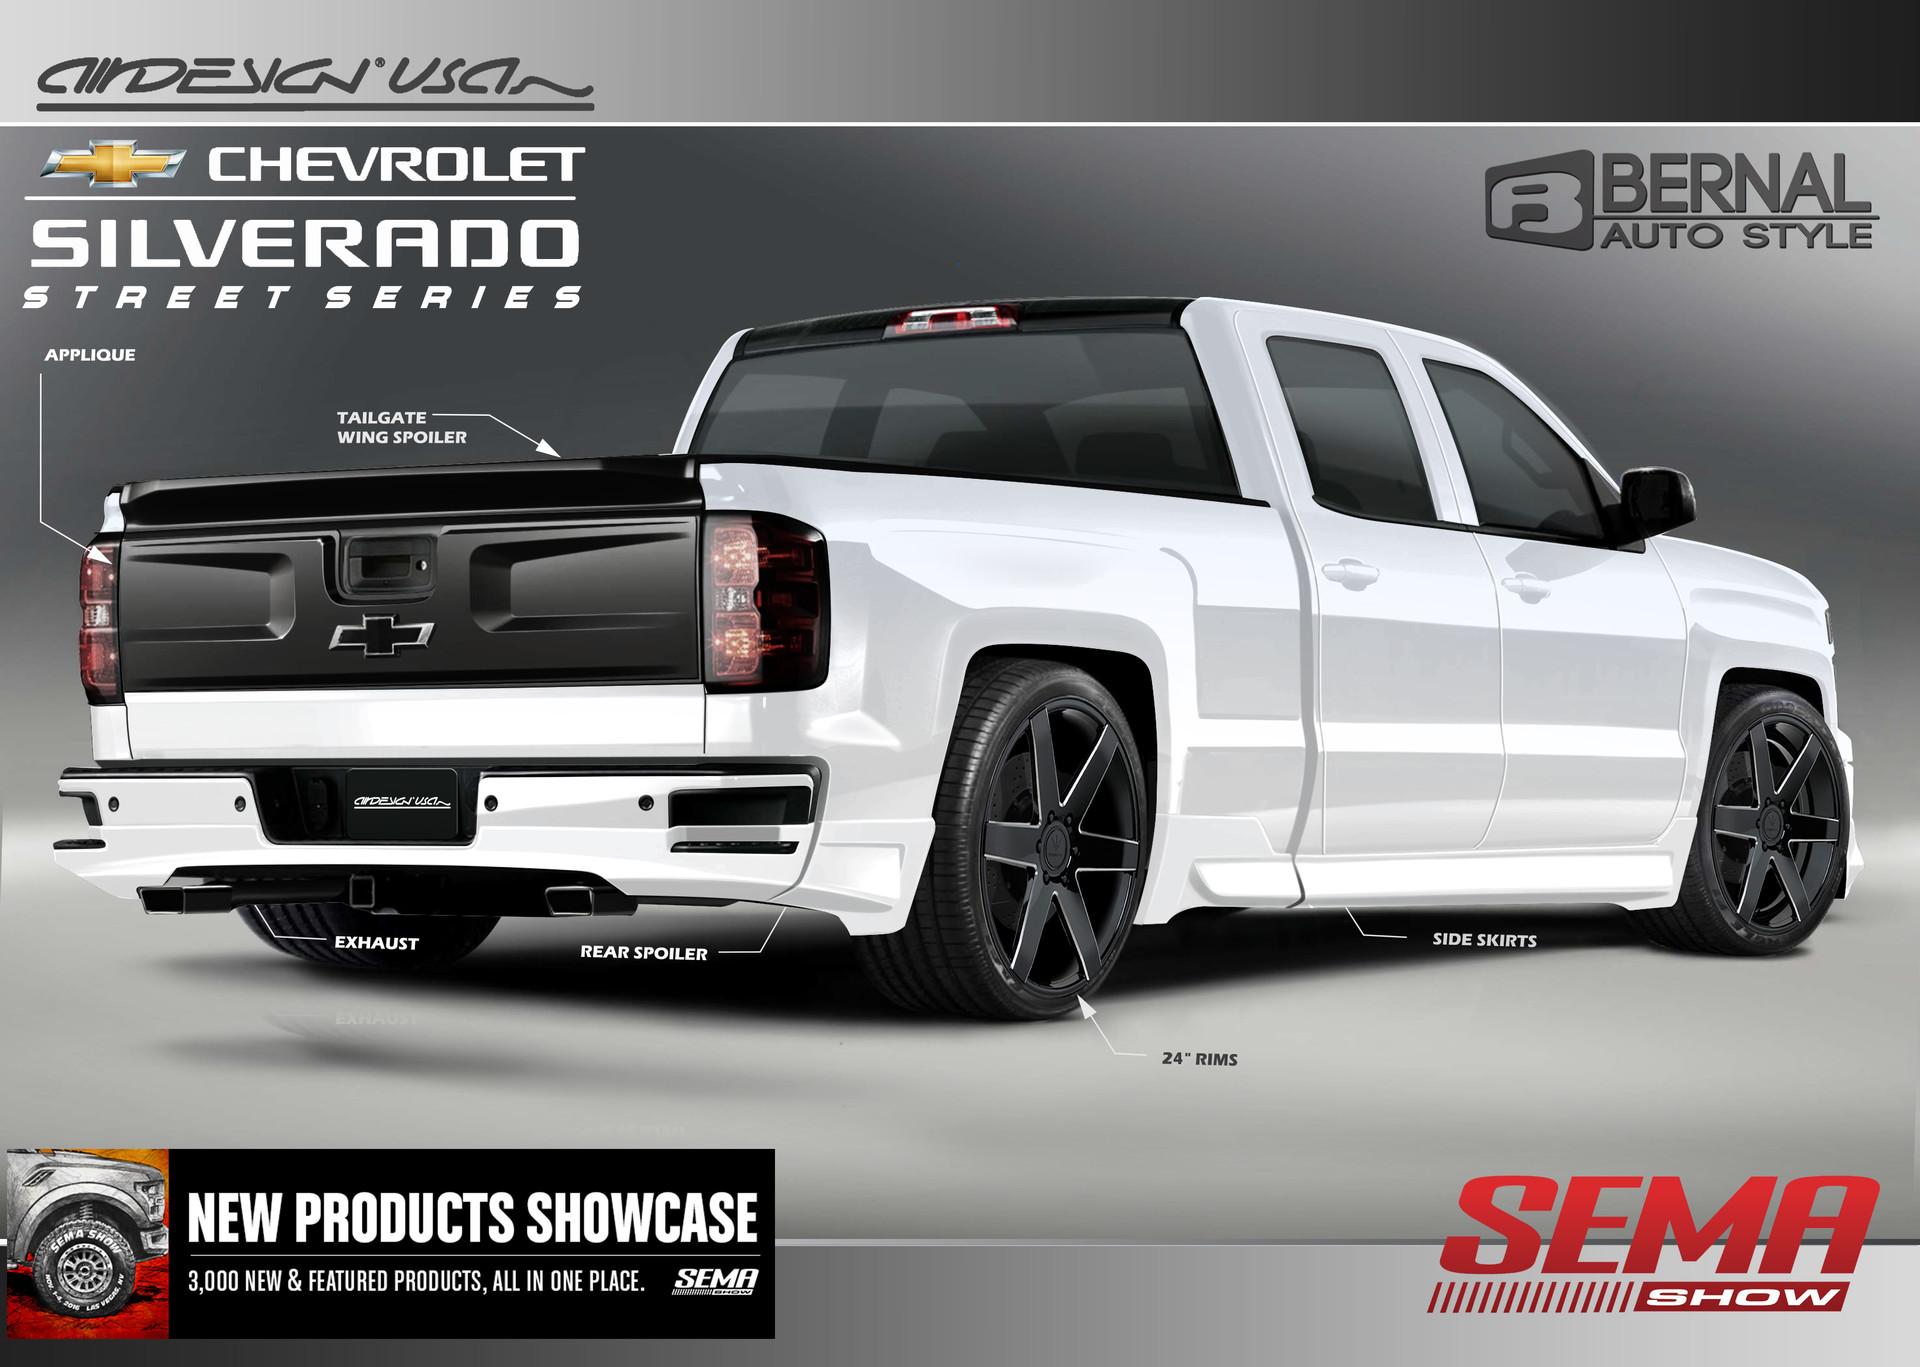 Rally Edition Silverado >> Matt Bernal - 2016 Chevy Silverado Air Design SEMA Street ...